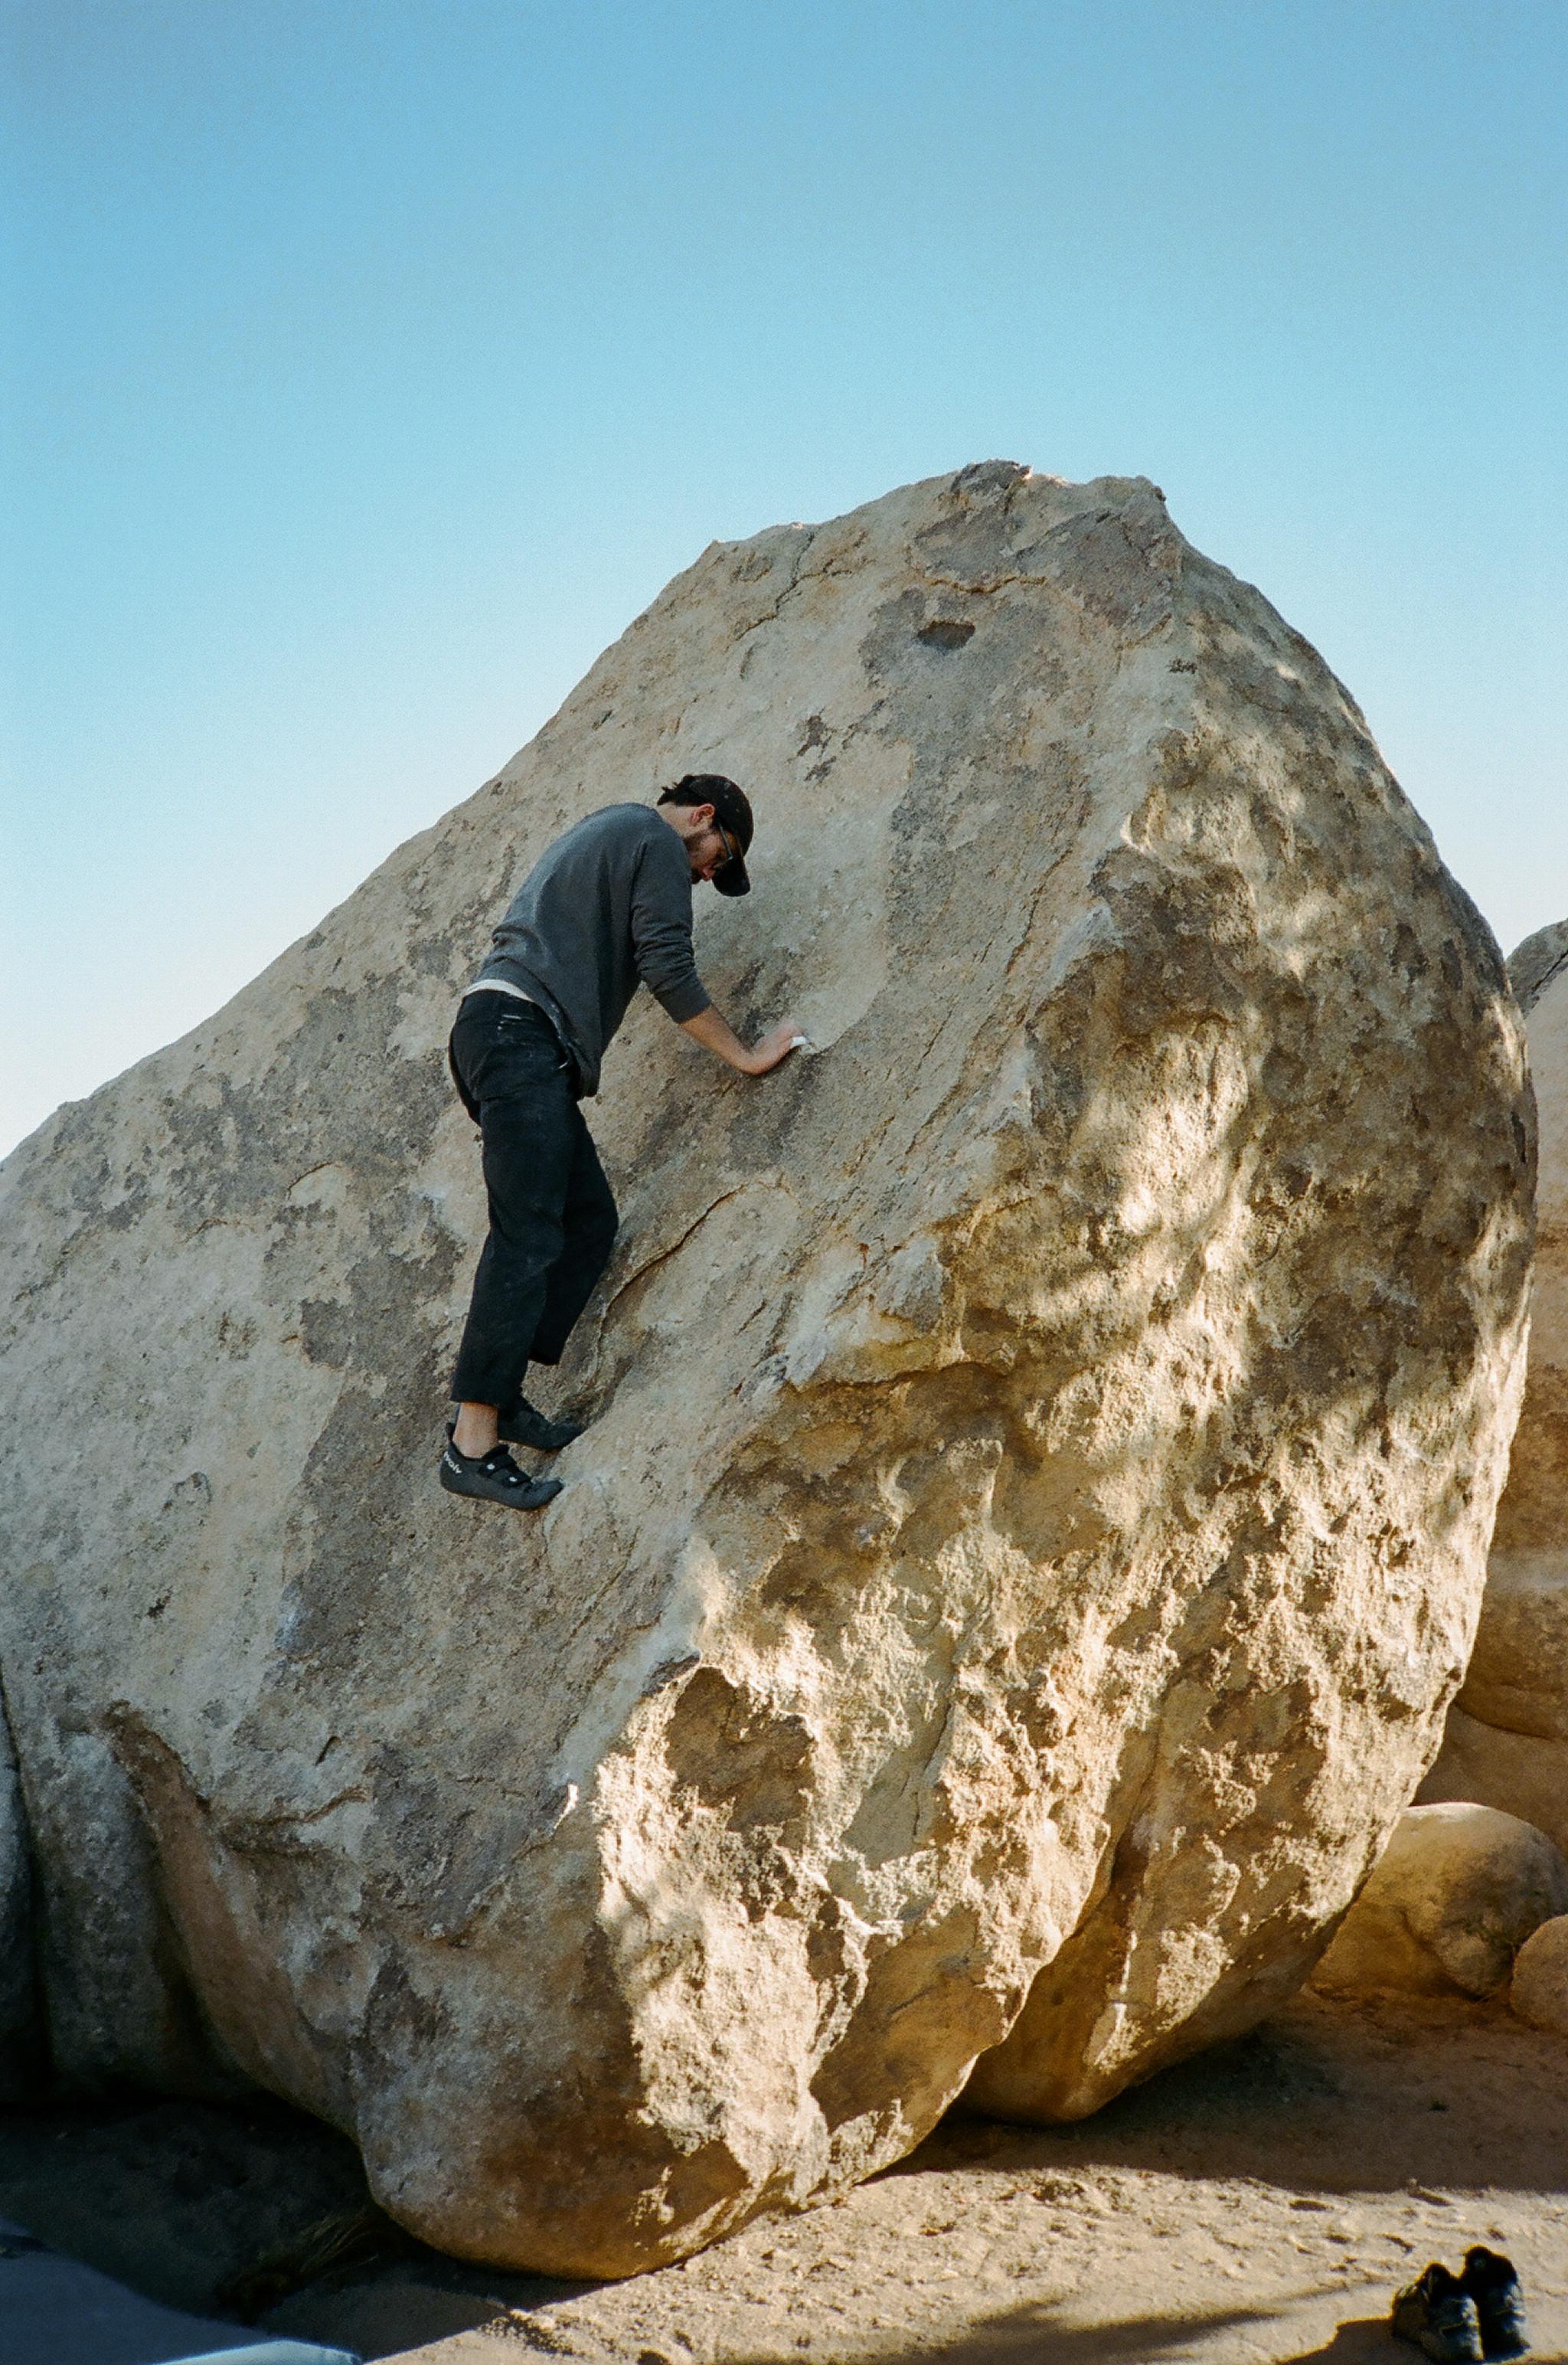 Southern California Film photographer